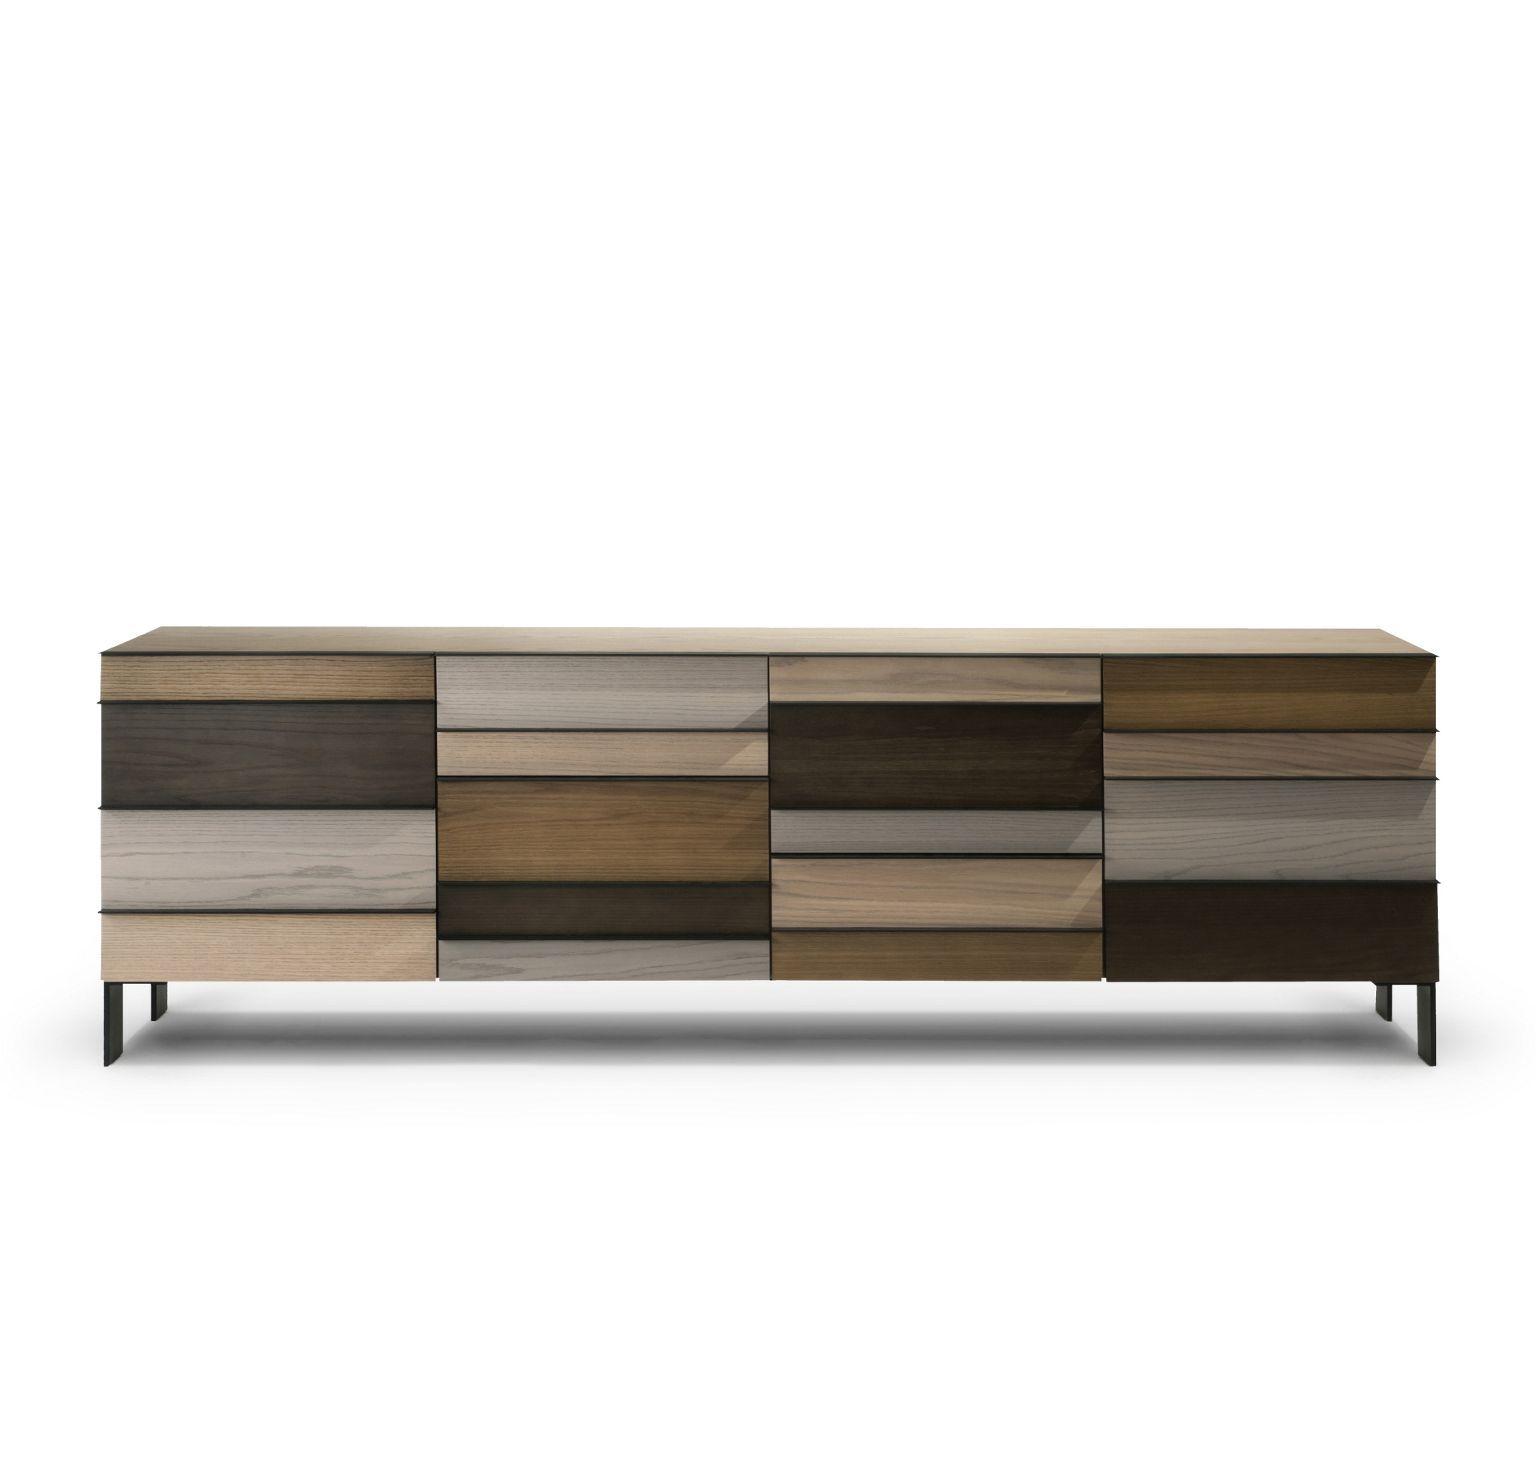 Colors Bois Sideboard Sideboard Pinterest Drawers Doors And  # Meuble Tv Beton Bois